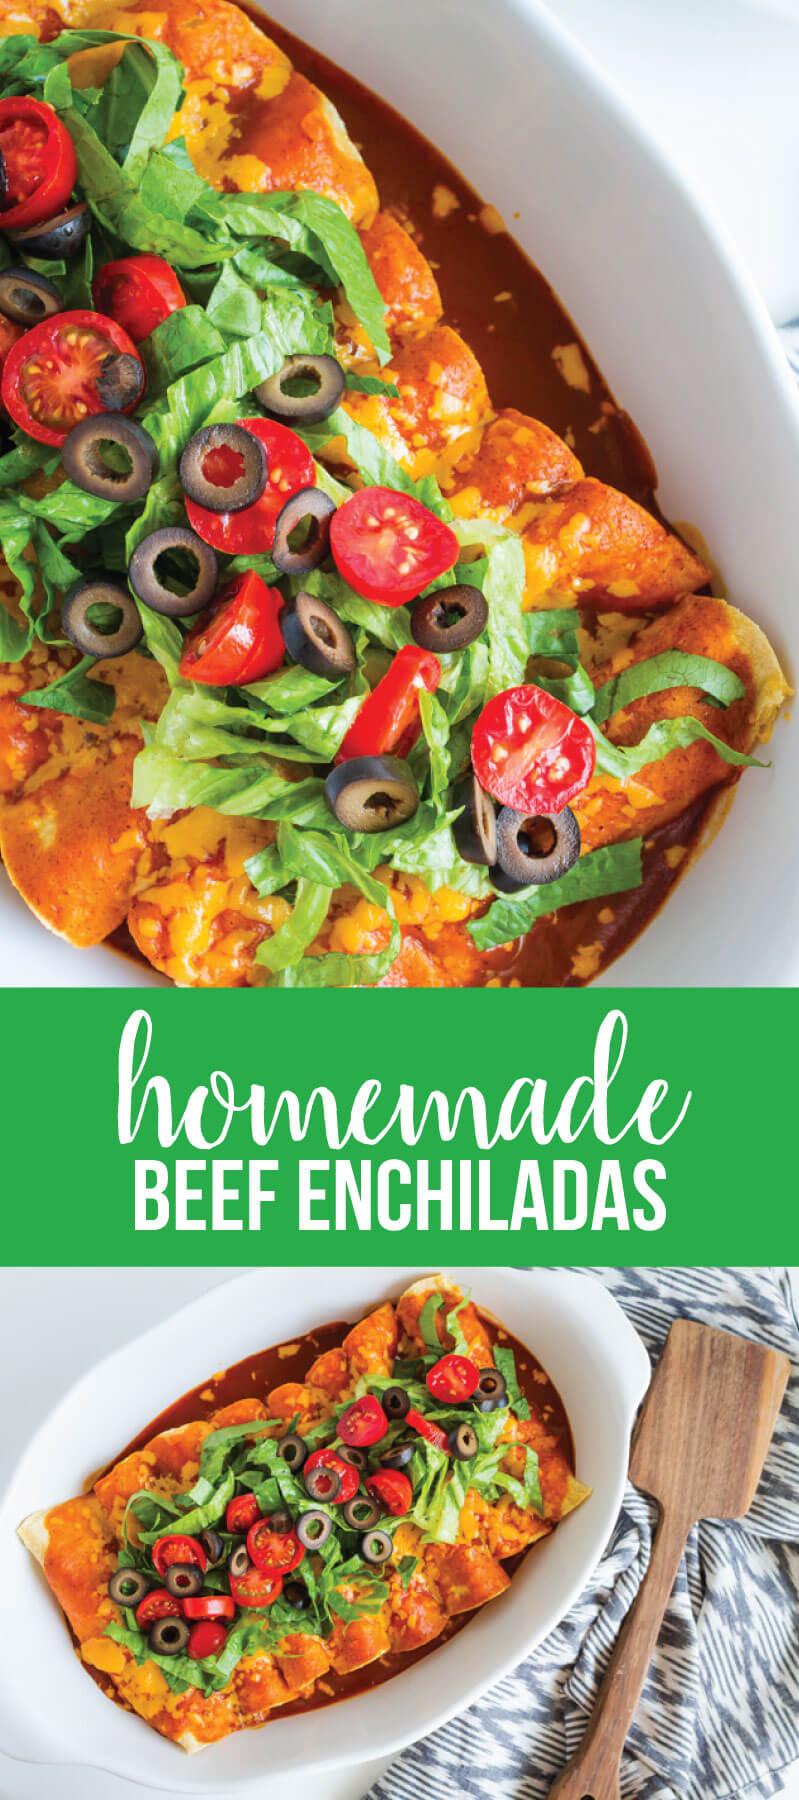 Homemade Beef Enchiladas! This main dish recipe is a family favorite.  www.thirtyhandmadedays.com